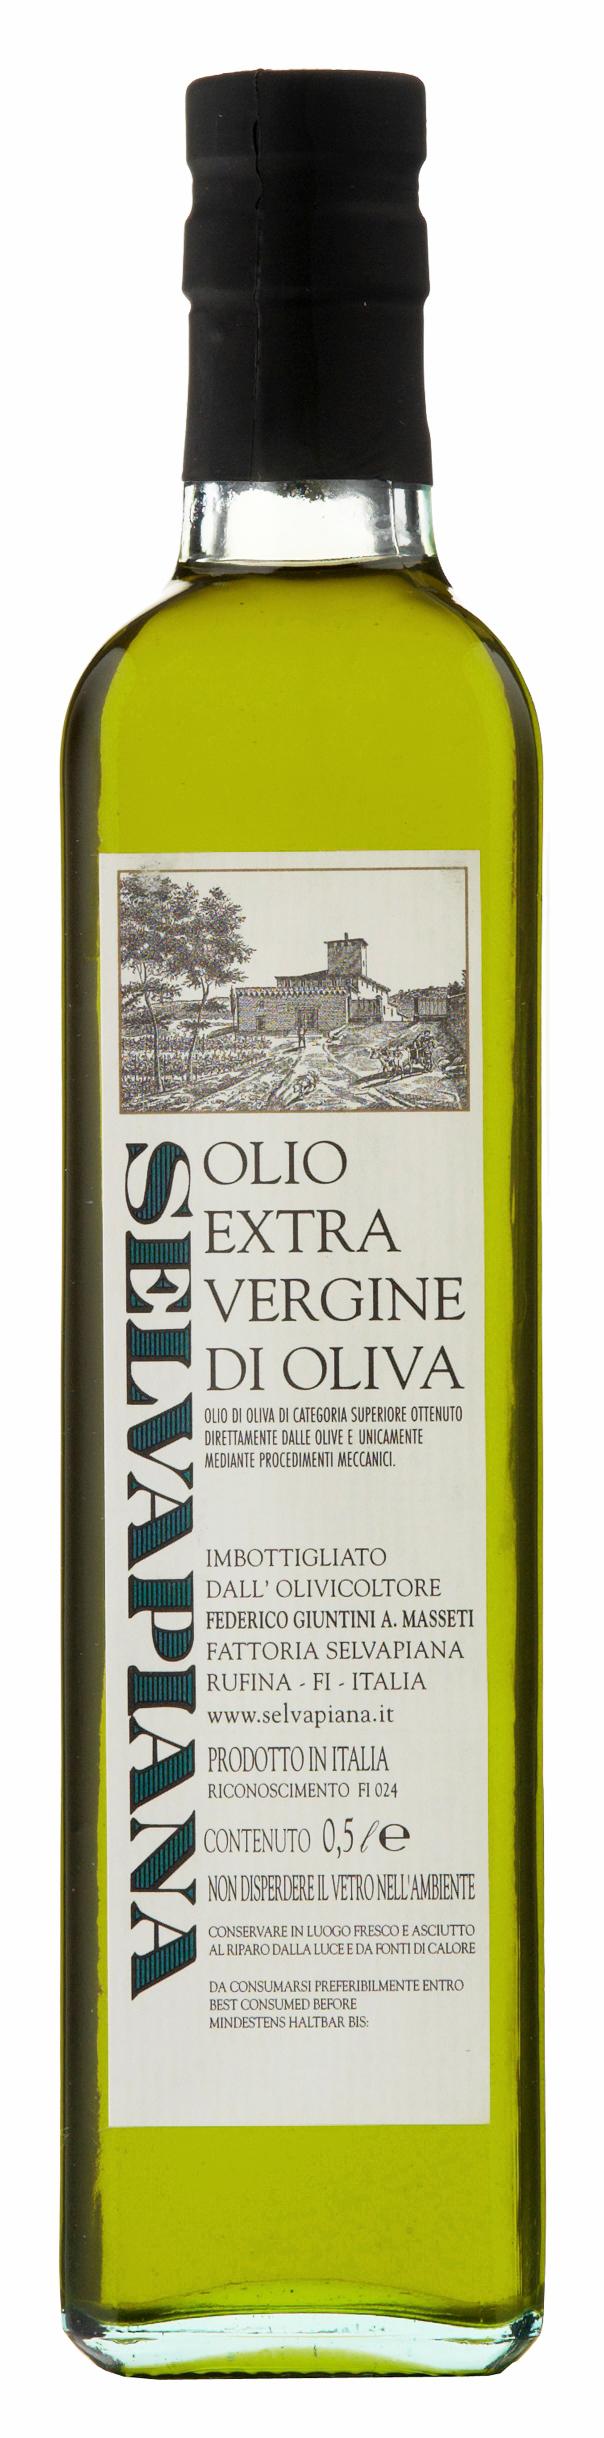 Selvapiana, Extra Virgin Olive Oil 2017